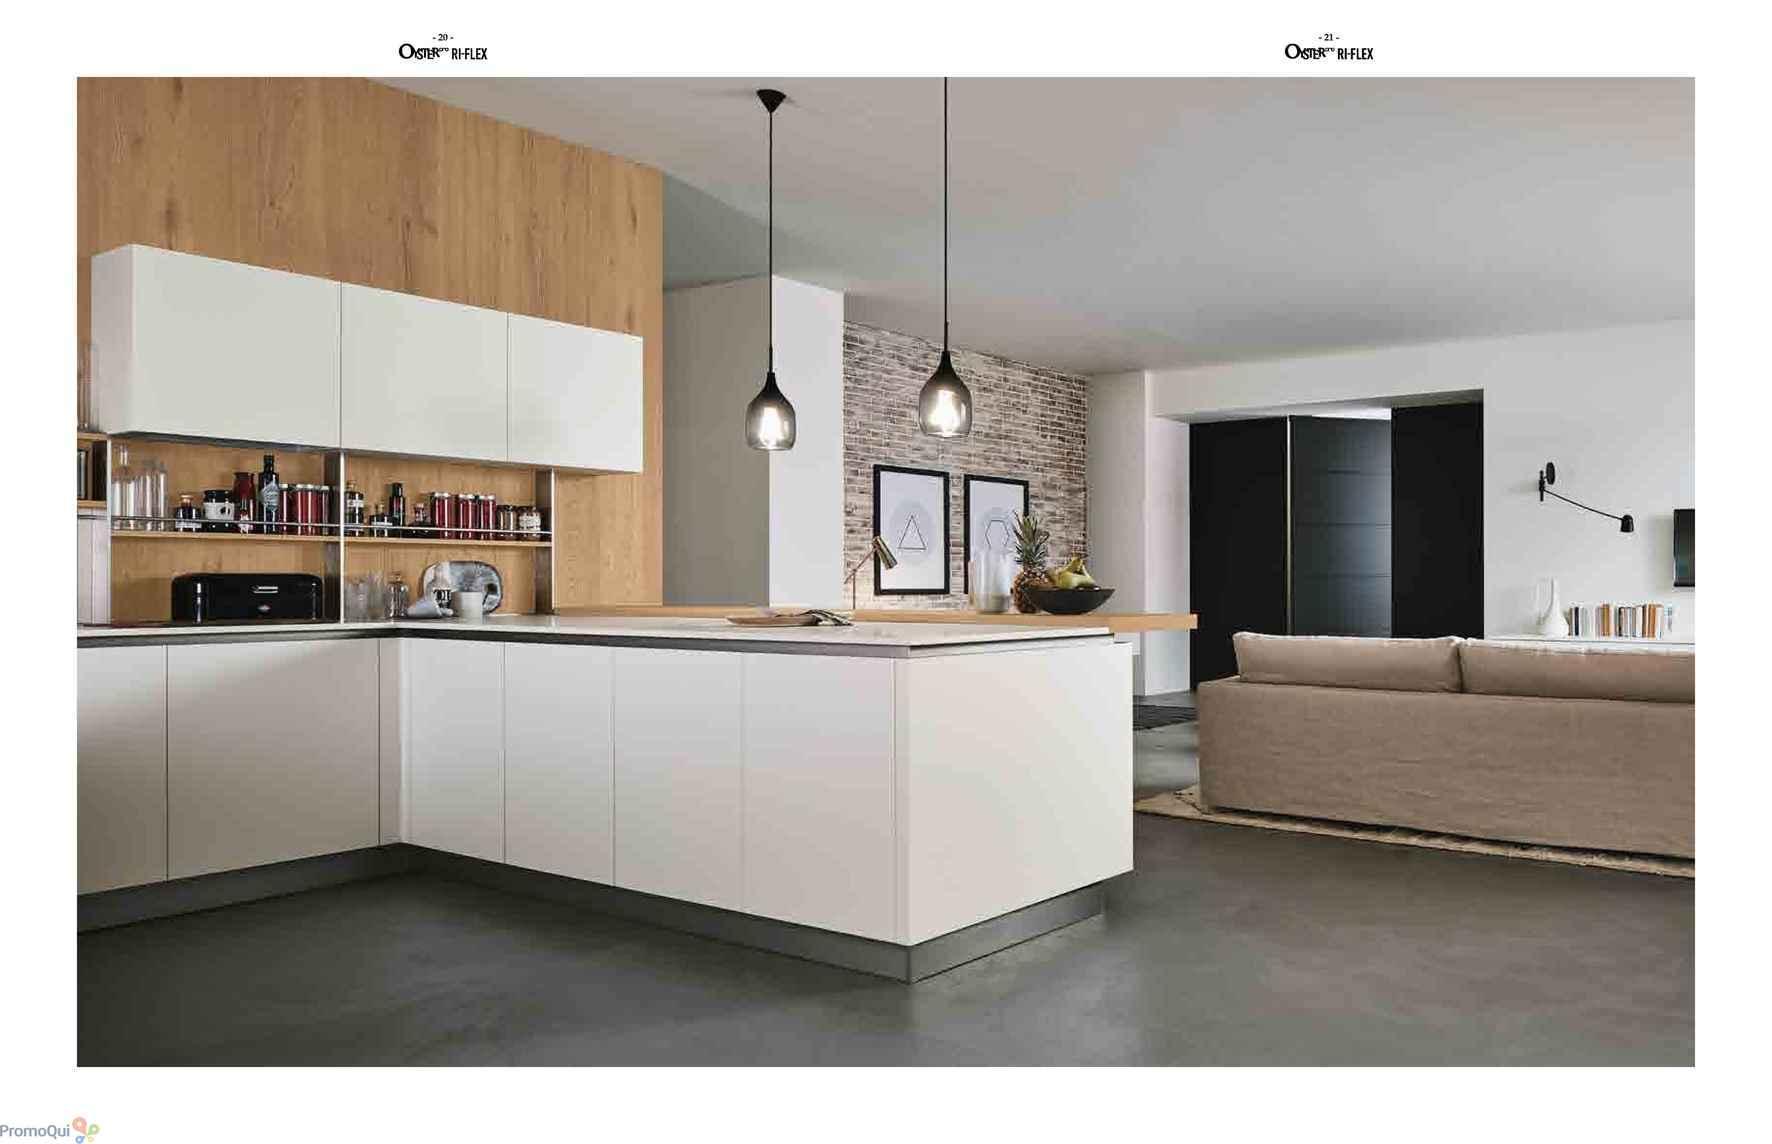 Stunning Veneta Cucine Reflex Images - Design & Ideas 2018 ...